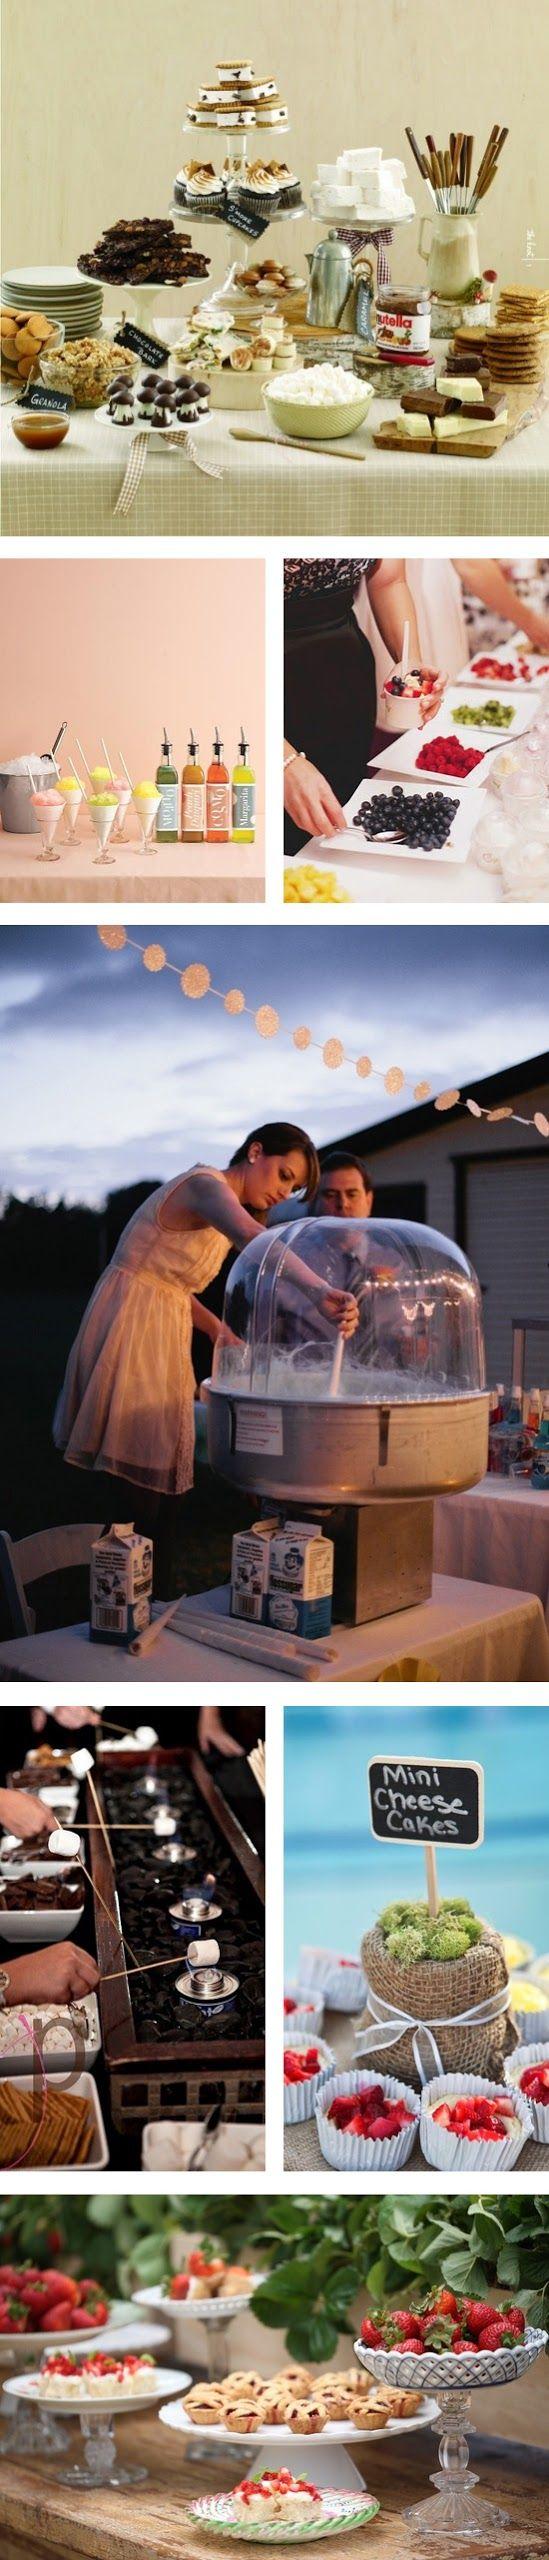 My Wedding Reception Ideas | Blog: Things We Love - Creative Food Stations